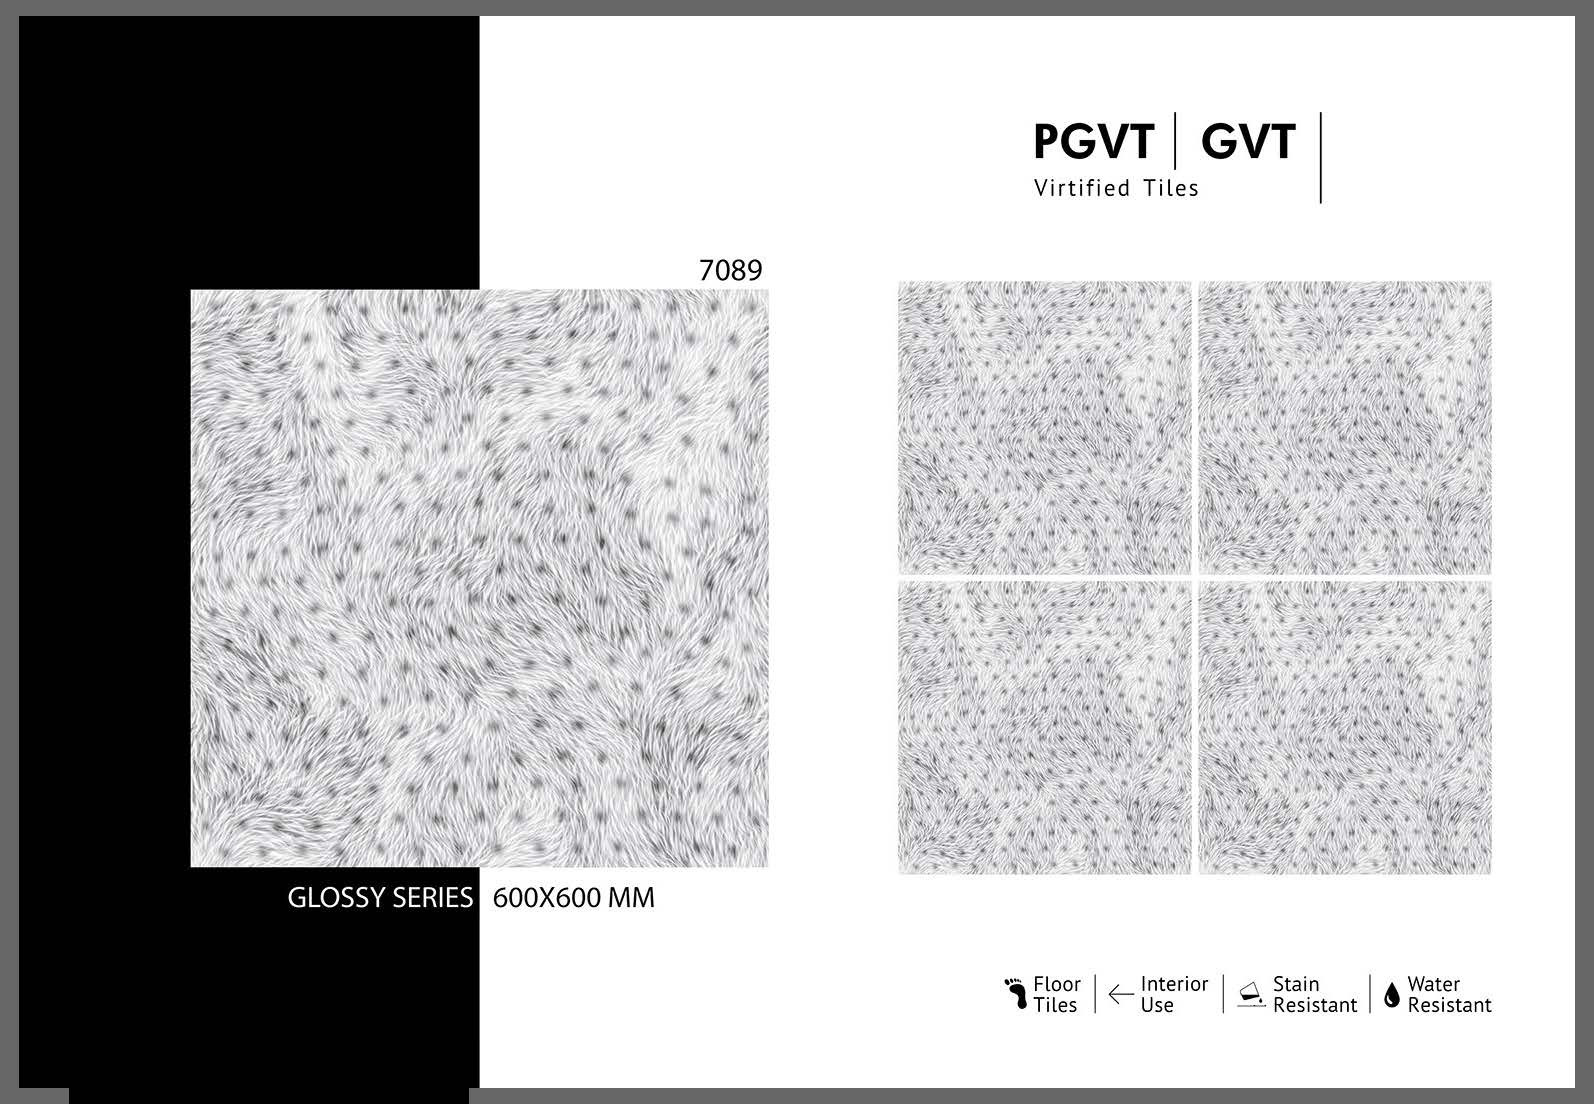 GVT 2X2 GLOSSY_Page_76.jpg